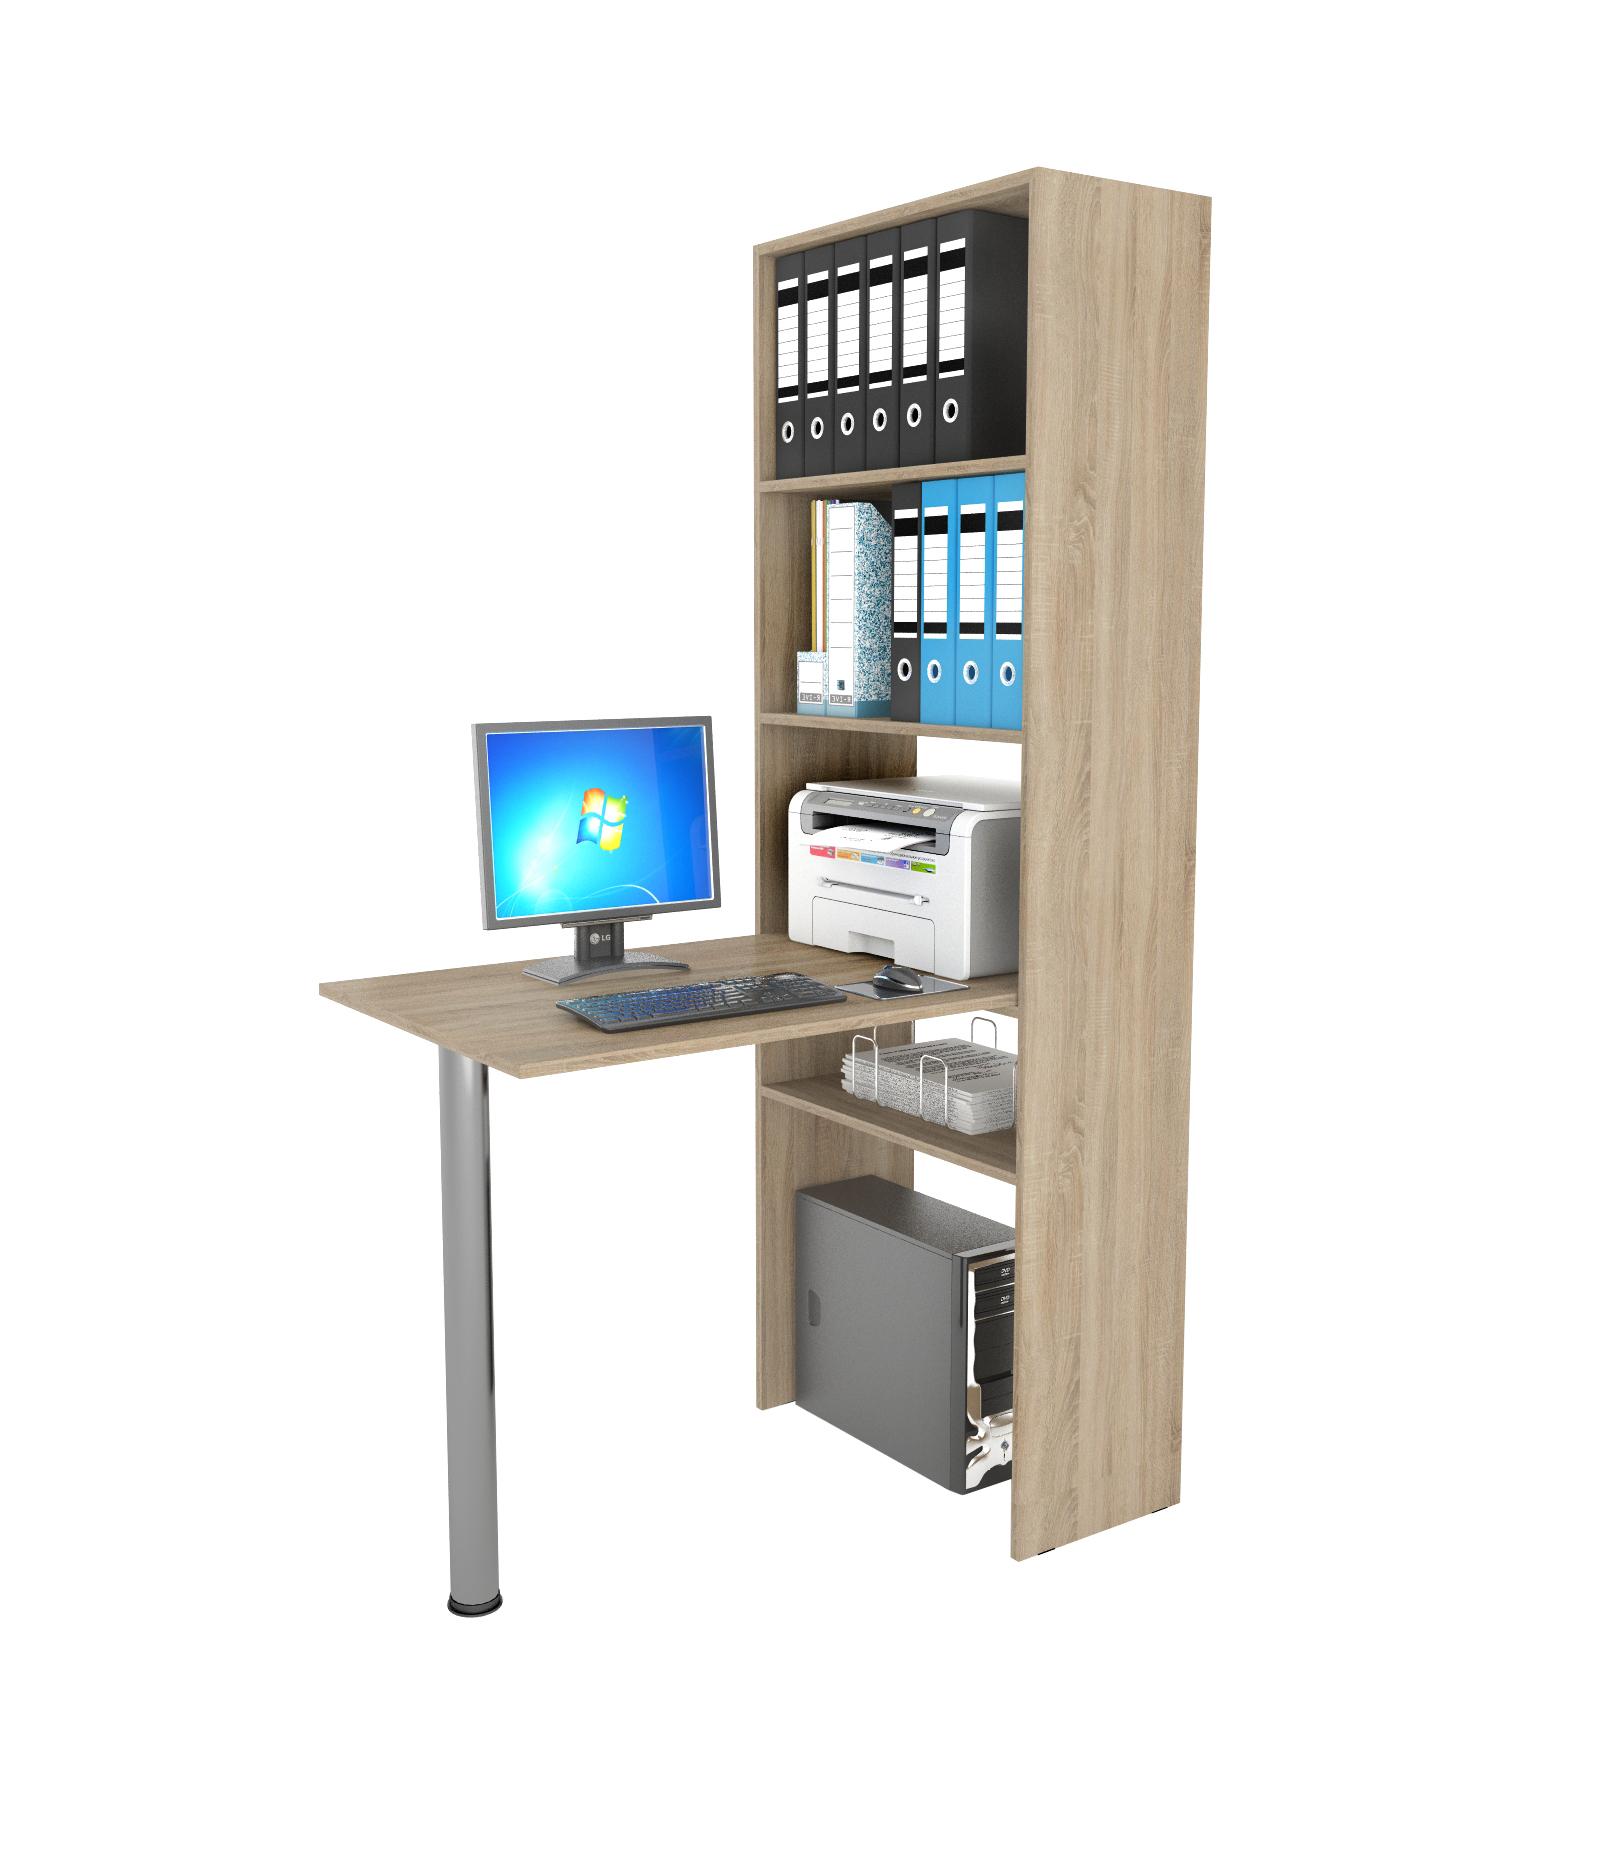 Компьютерный стол в комплекте МФ Мастер Рикс-4+Рикс-6 110x97,8x171,6, дуб сонома